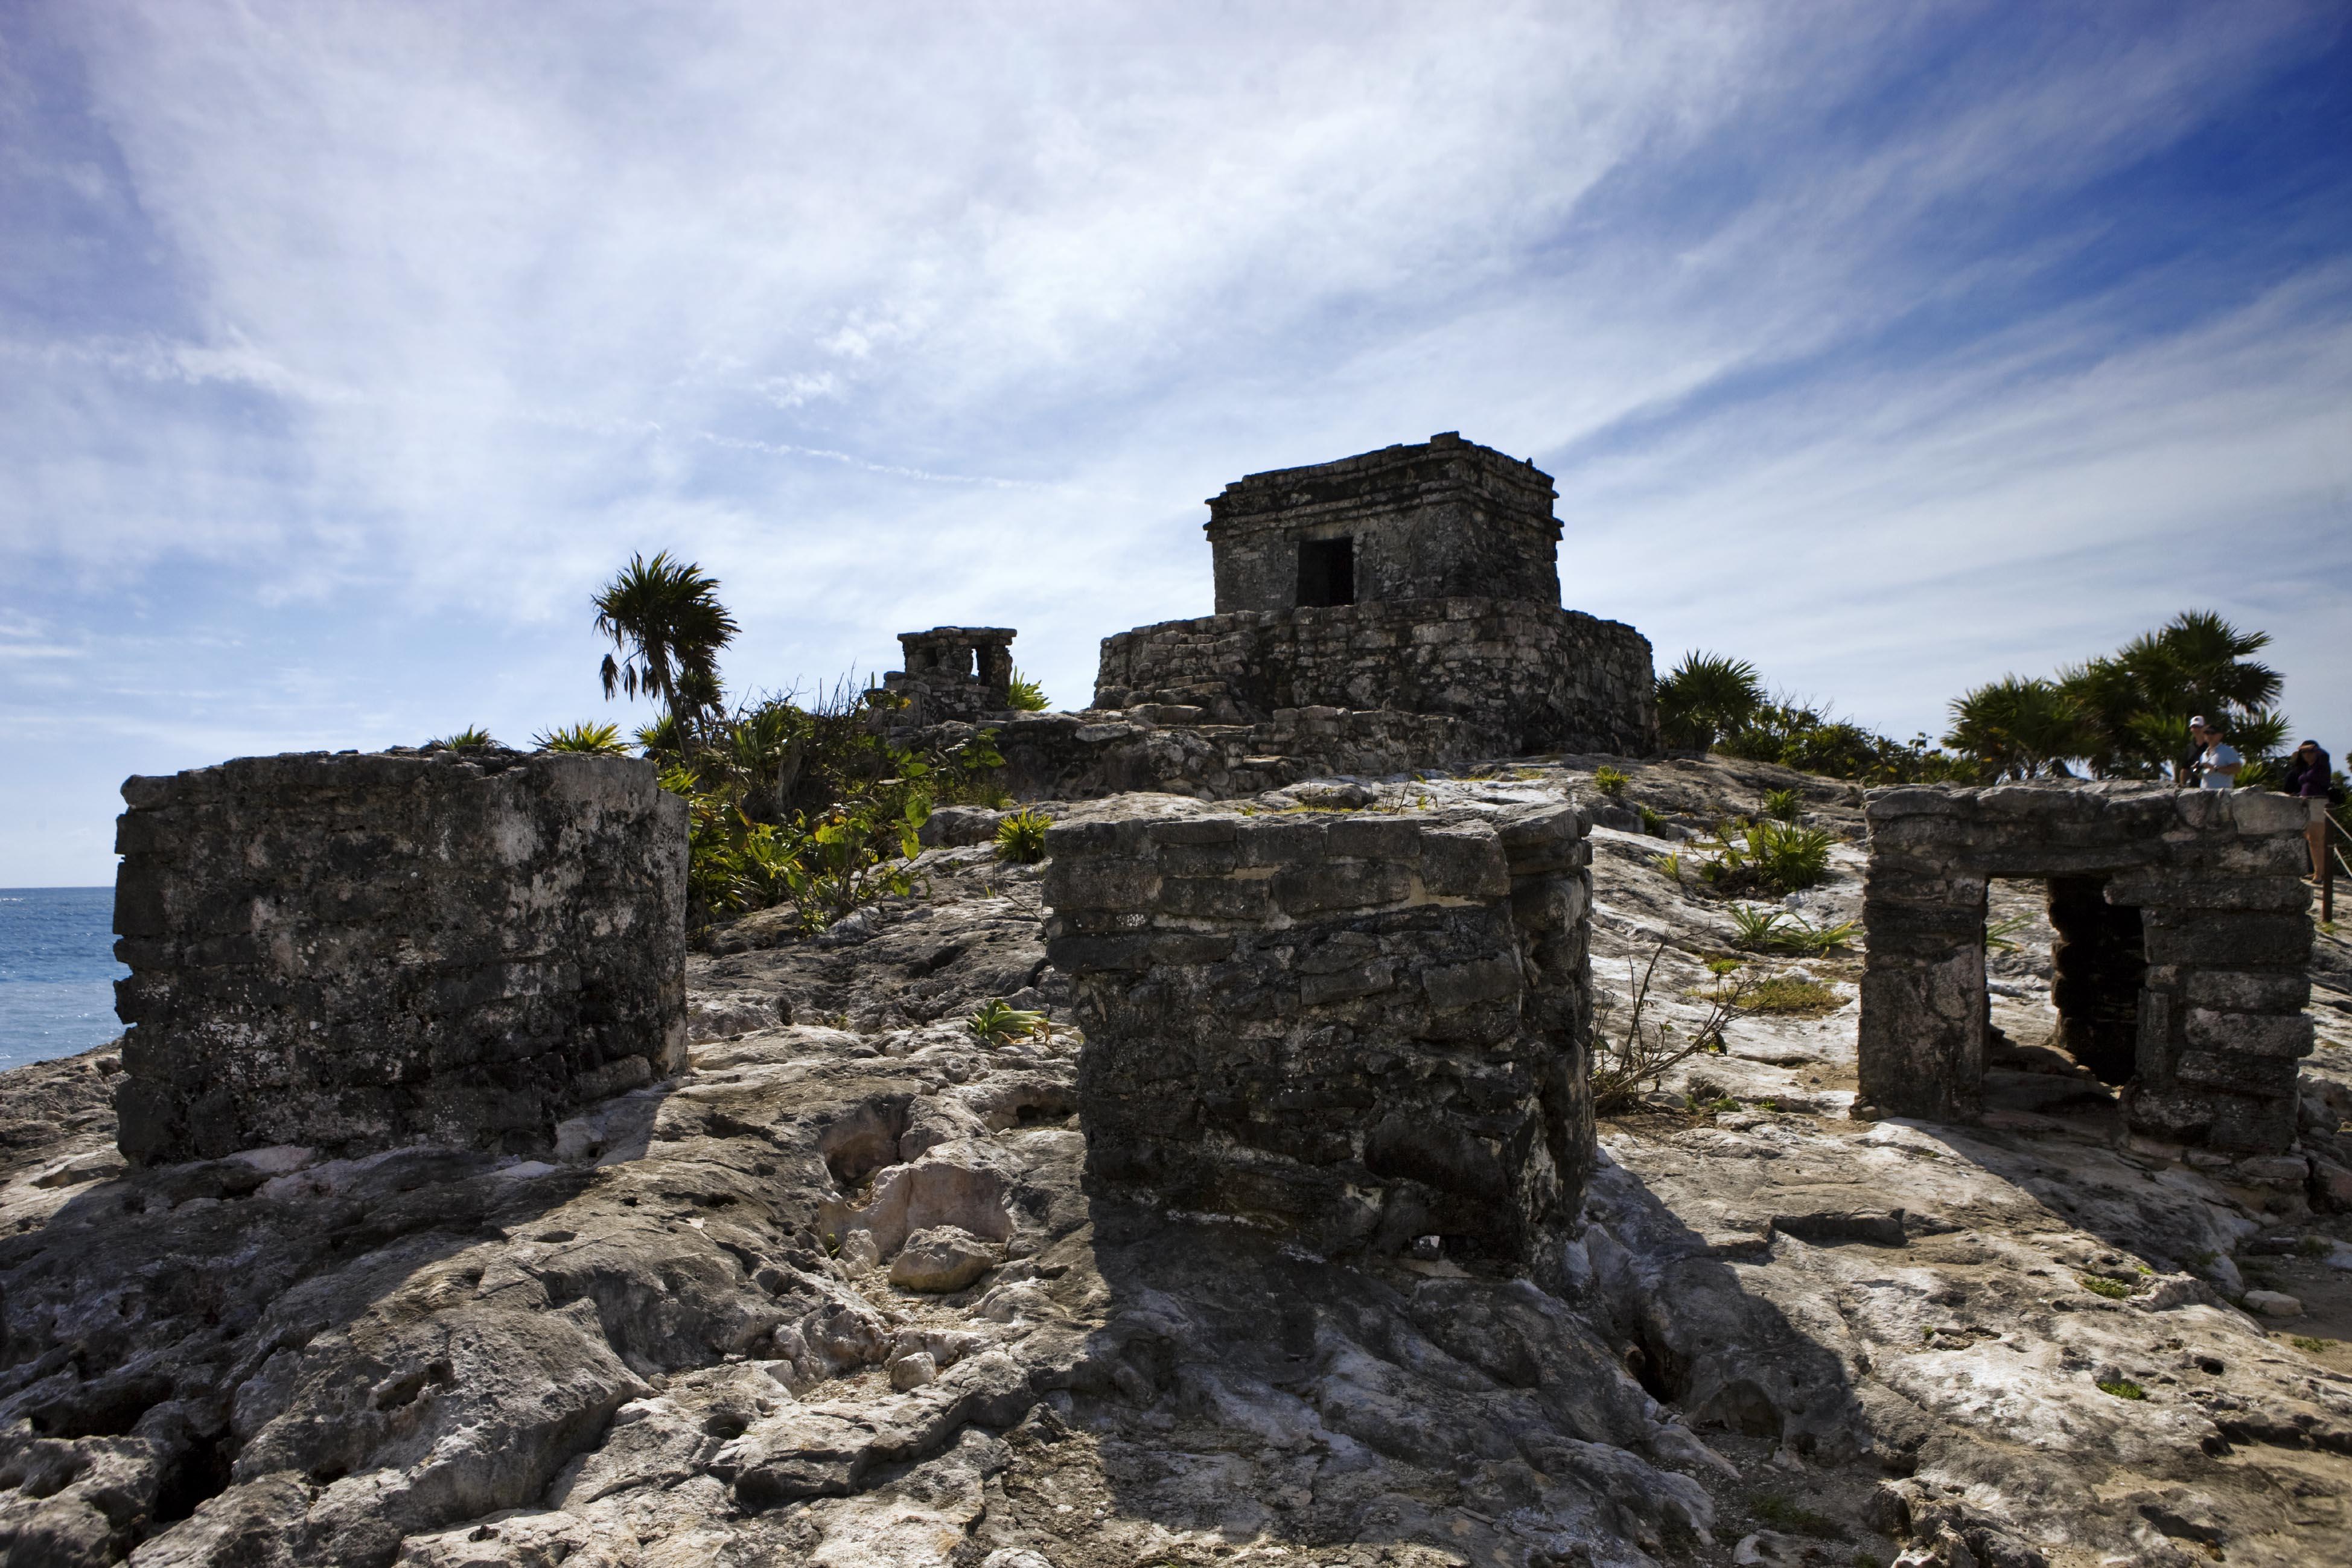 Qué hacer en Tulum, Quintana Roo